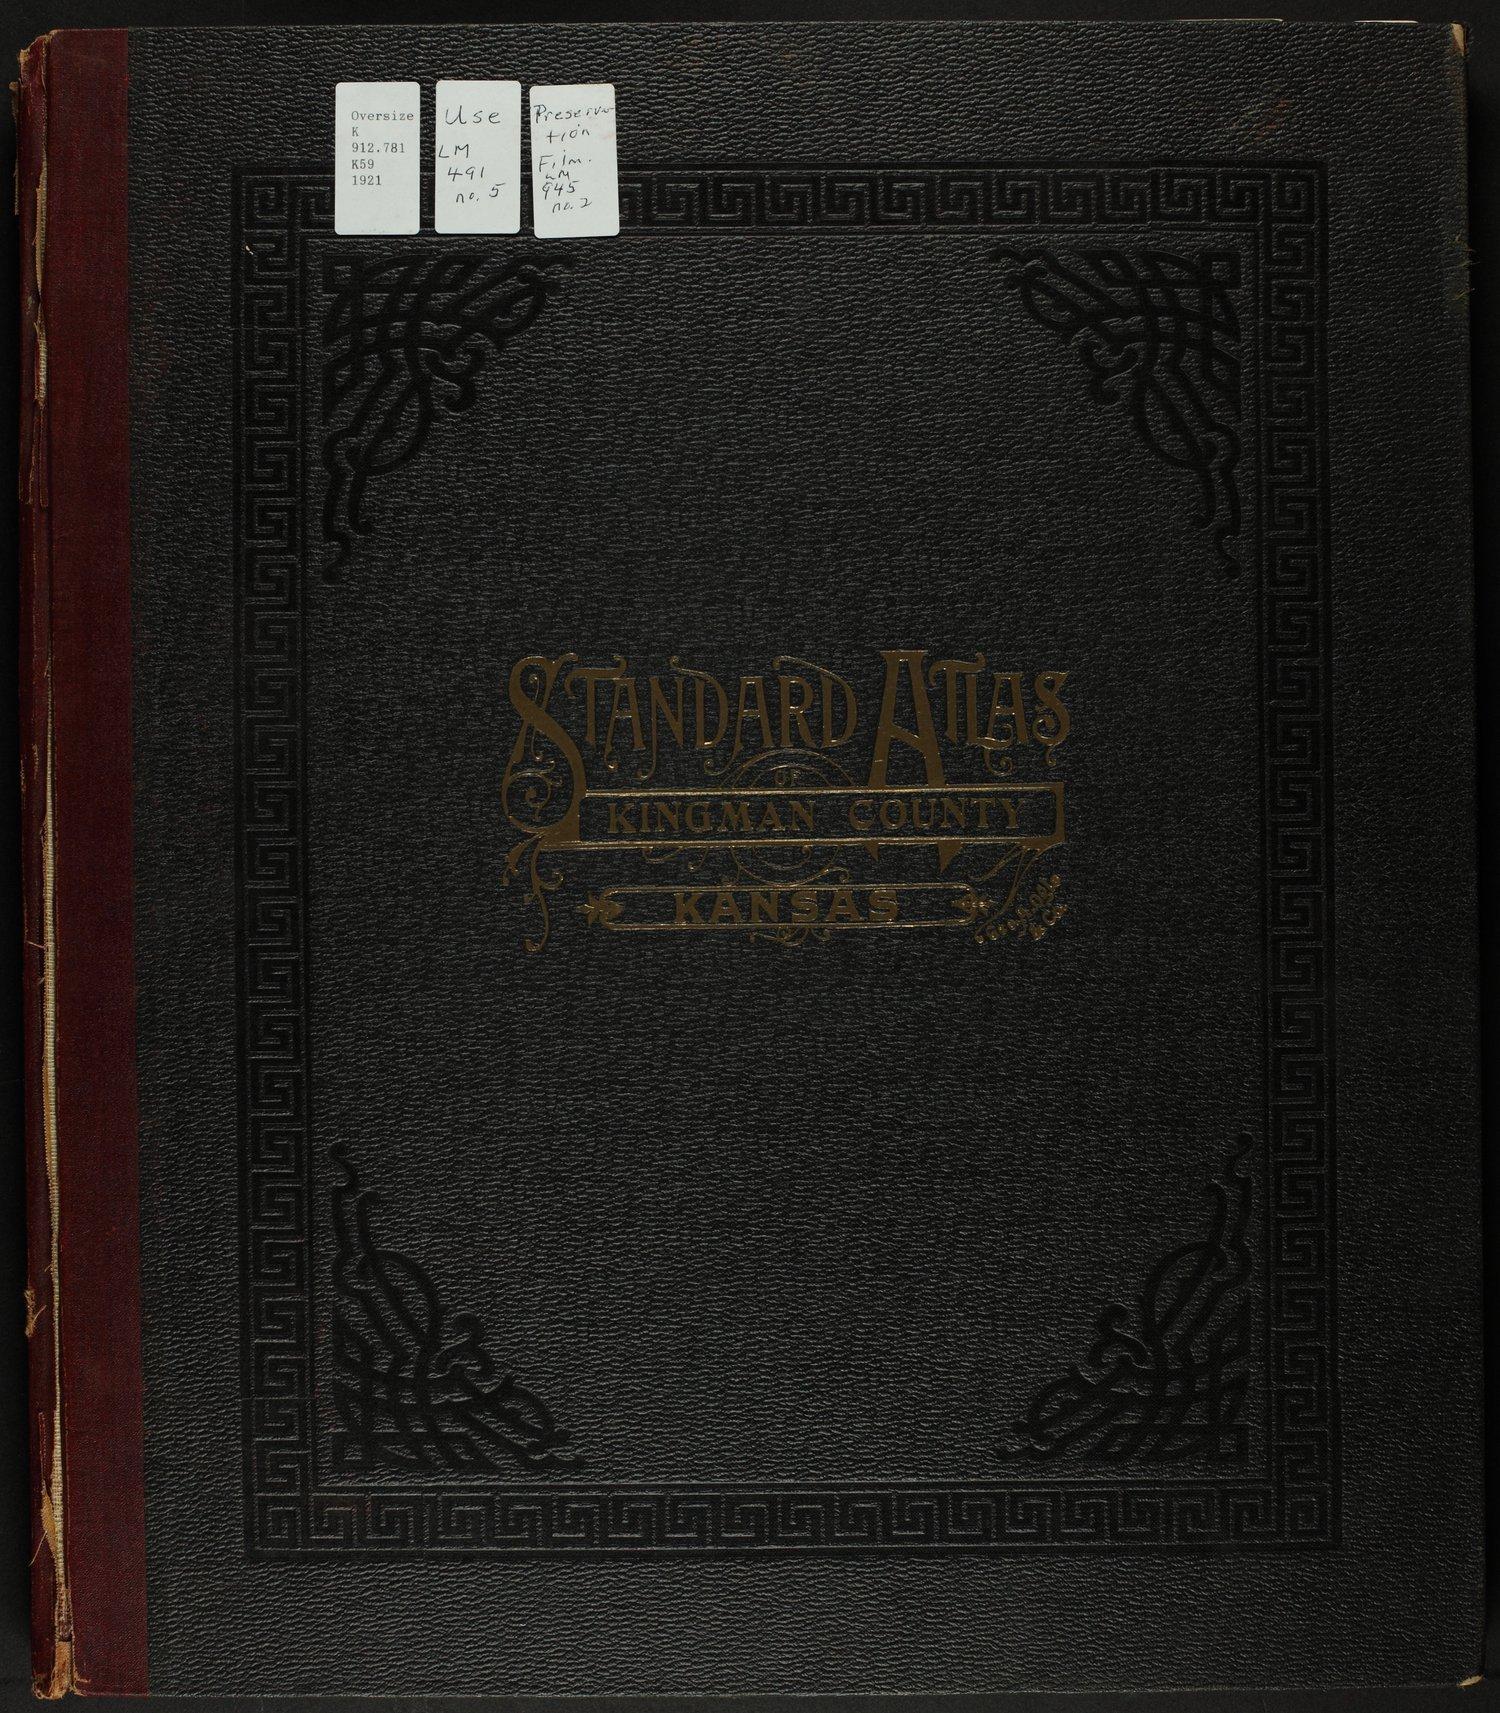 Standard atlas of Kingman County, Kansas - Front Cover